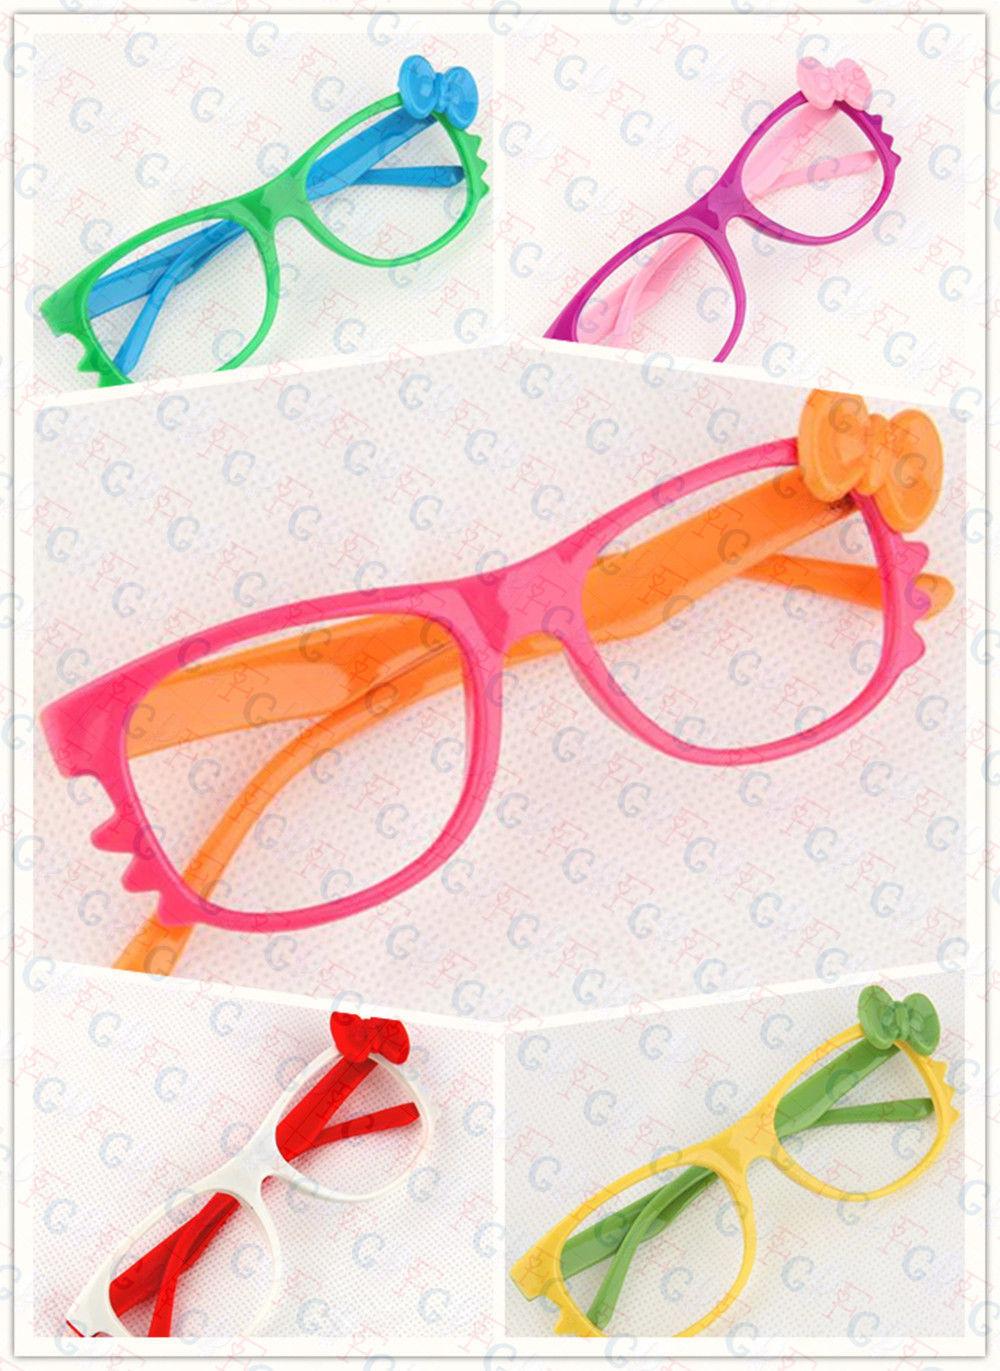 Super Cute Costume Glass Frames for Kids NO LENS Cat Eye Whisker Bowknot Cosplay